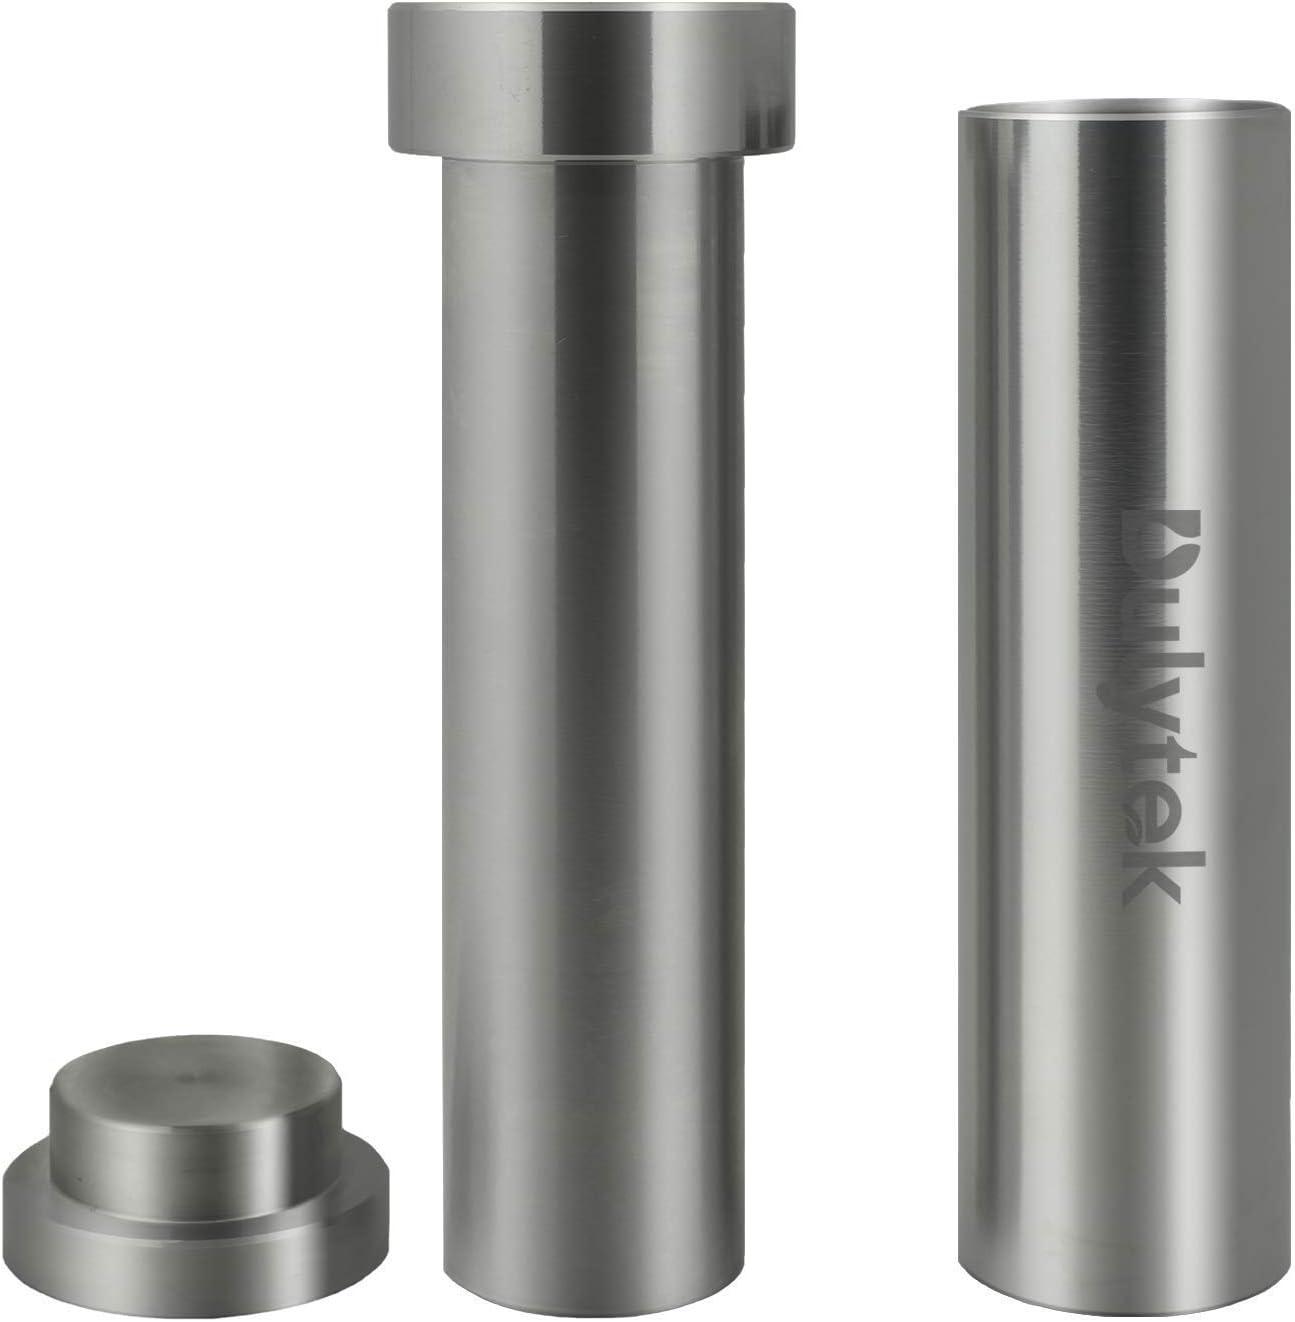 Dulytek Hammer Style Pollen/Herb Press - Cylinder Food-Grade Stainless Steel - X-Large Size - 5.5